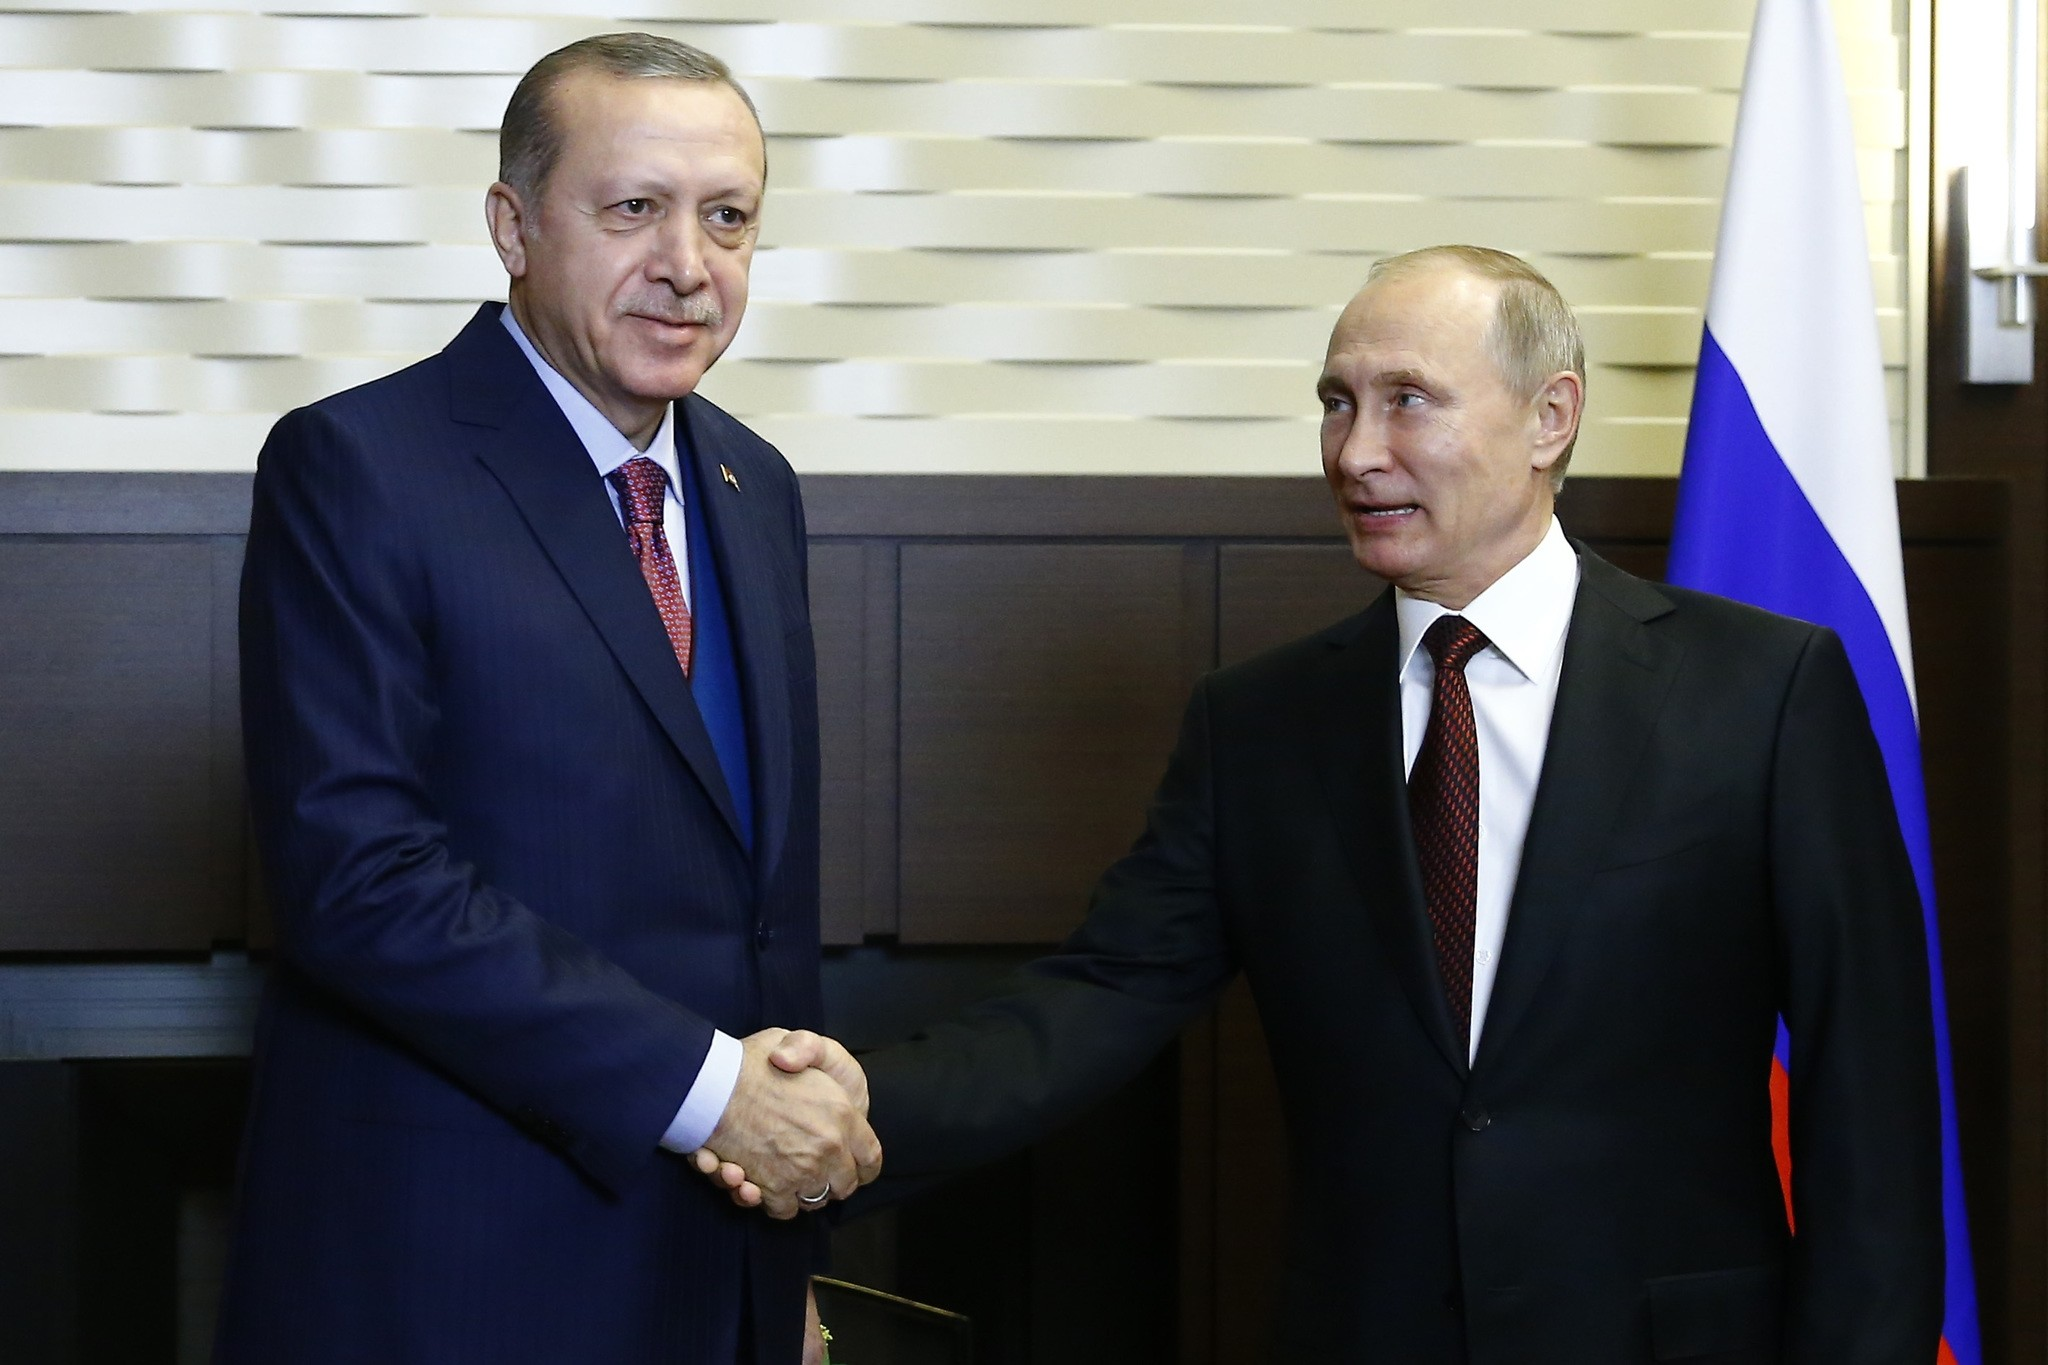 President Recep Tayyip Erdogan and his Russian counterpart Vladimir Putin met met to discuss bilateral ties at the presidential residence in Sochi on Nov. 13, 2017. (AA Photo)